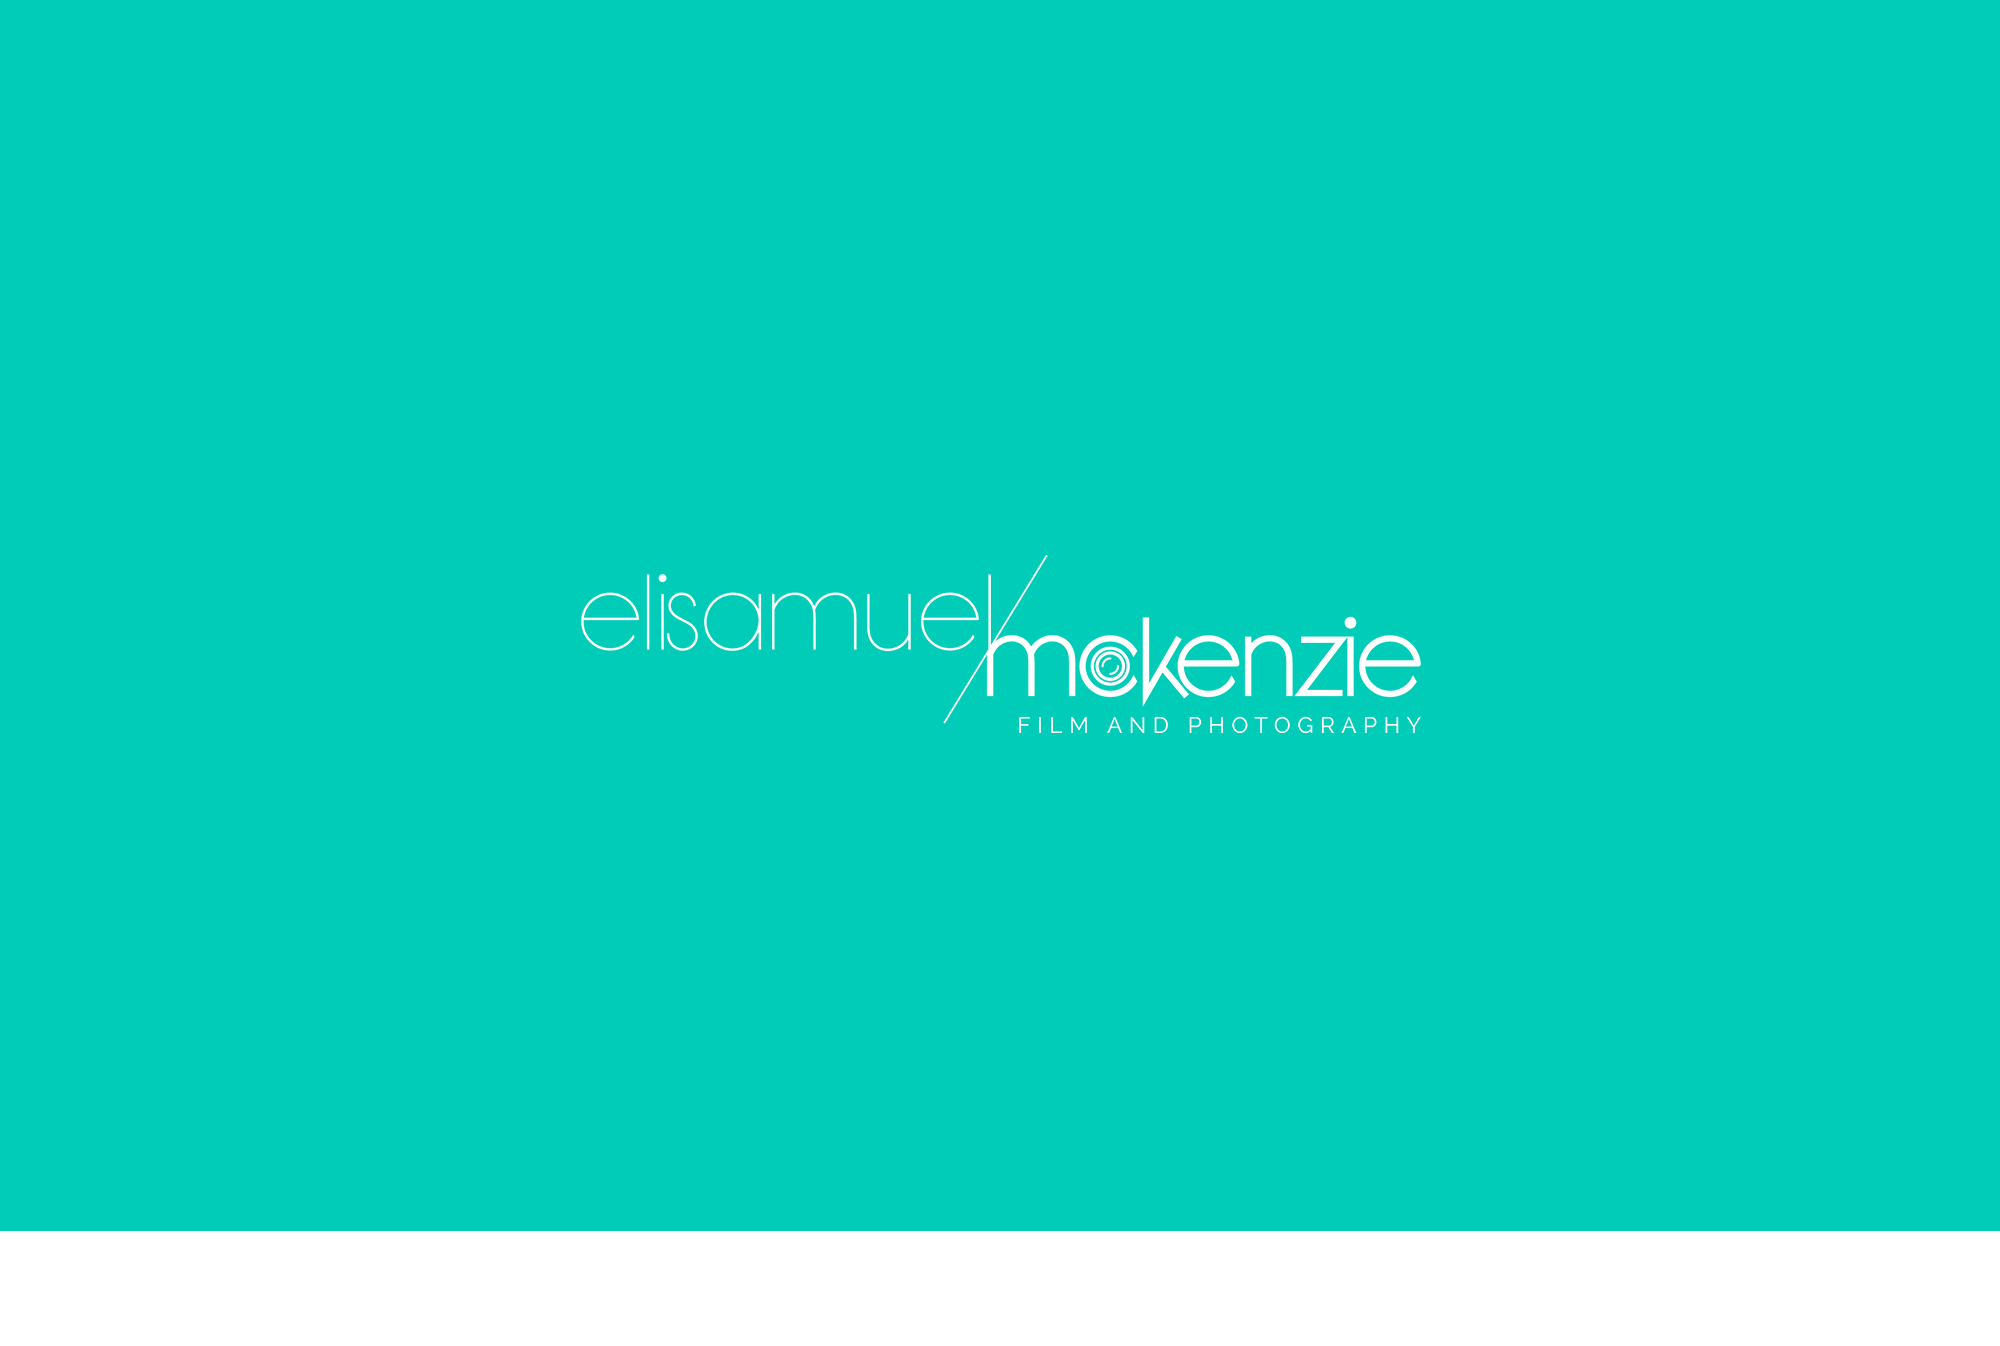 Elisamuel Mckenzie/Film and Photography